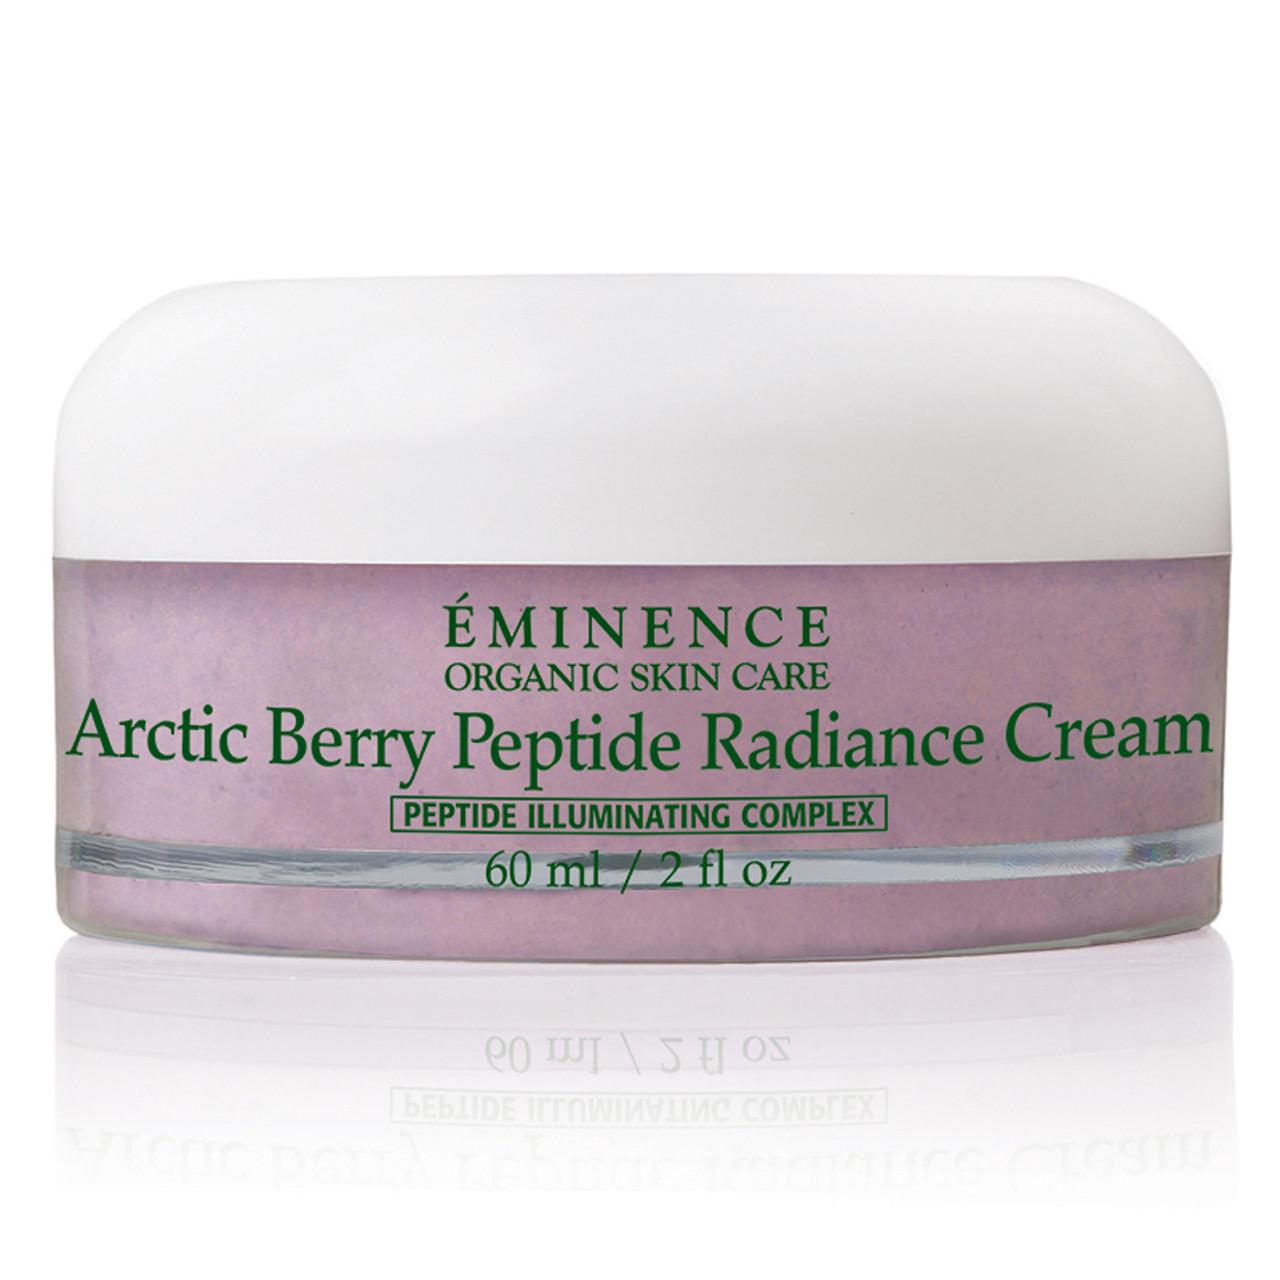 Eminence Arctic Berry Peptide Radiance Cream BeautifiedYou.com